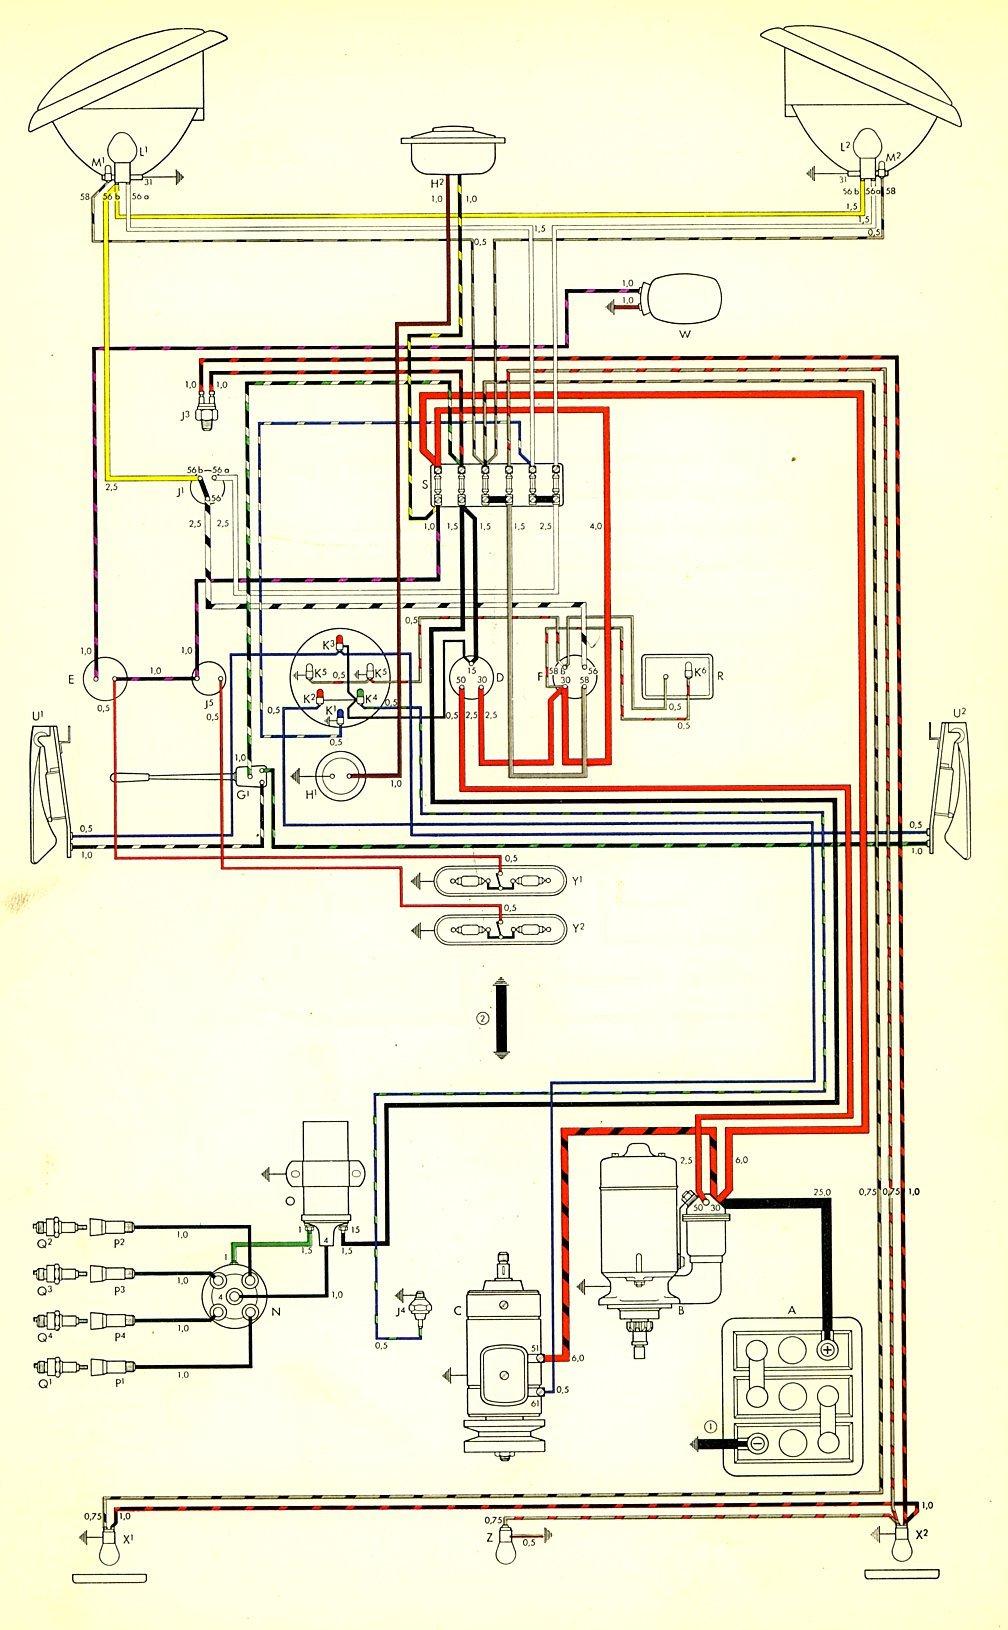 1977 C10 Alternator Wiring Diagram 1959 Bus Wiring Diagram Thegoldenbug Com